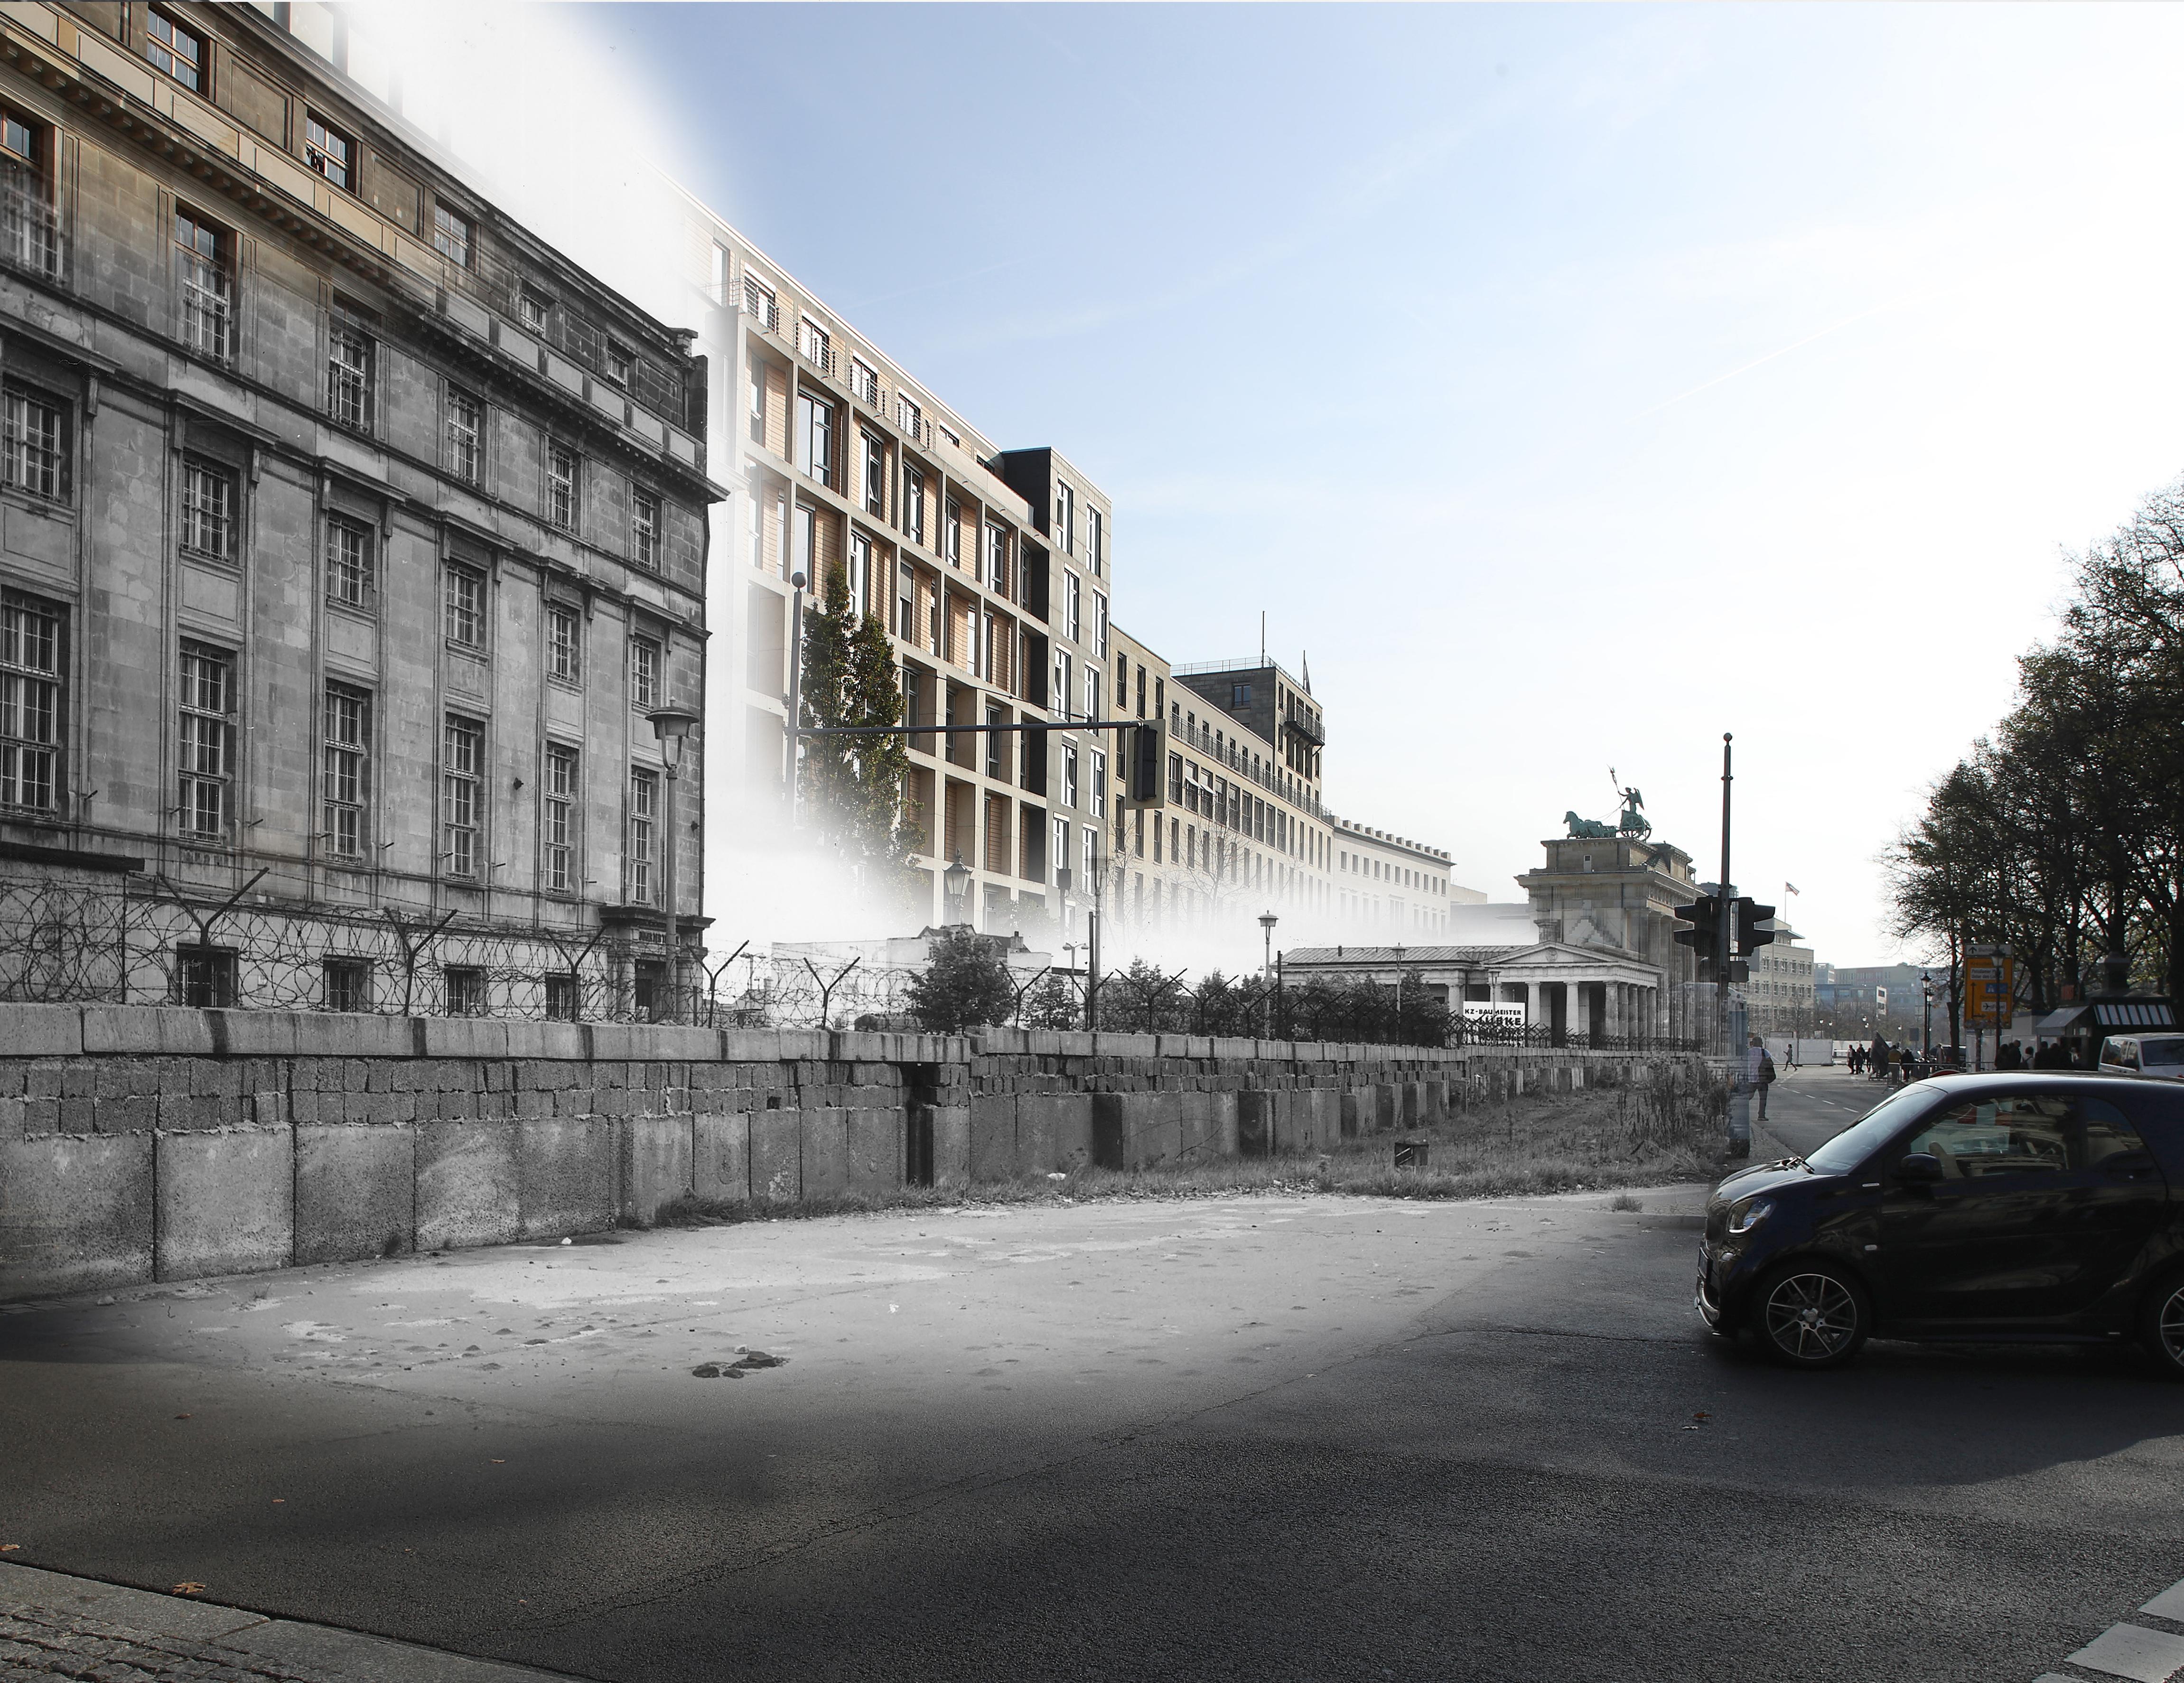 This digital composite image shows Scheidemannstrasse near the Brandenburg Gate in Berlin in 1966 (John Waterman/Fox Photos/Getty Images) and on October 23, 2019 (Sean Gallup).